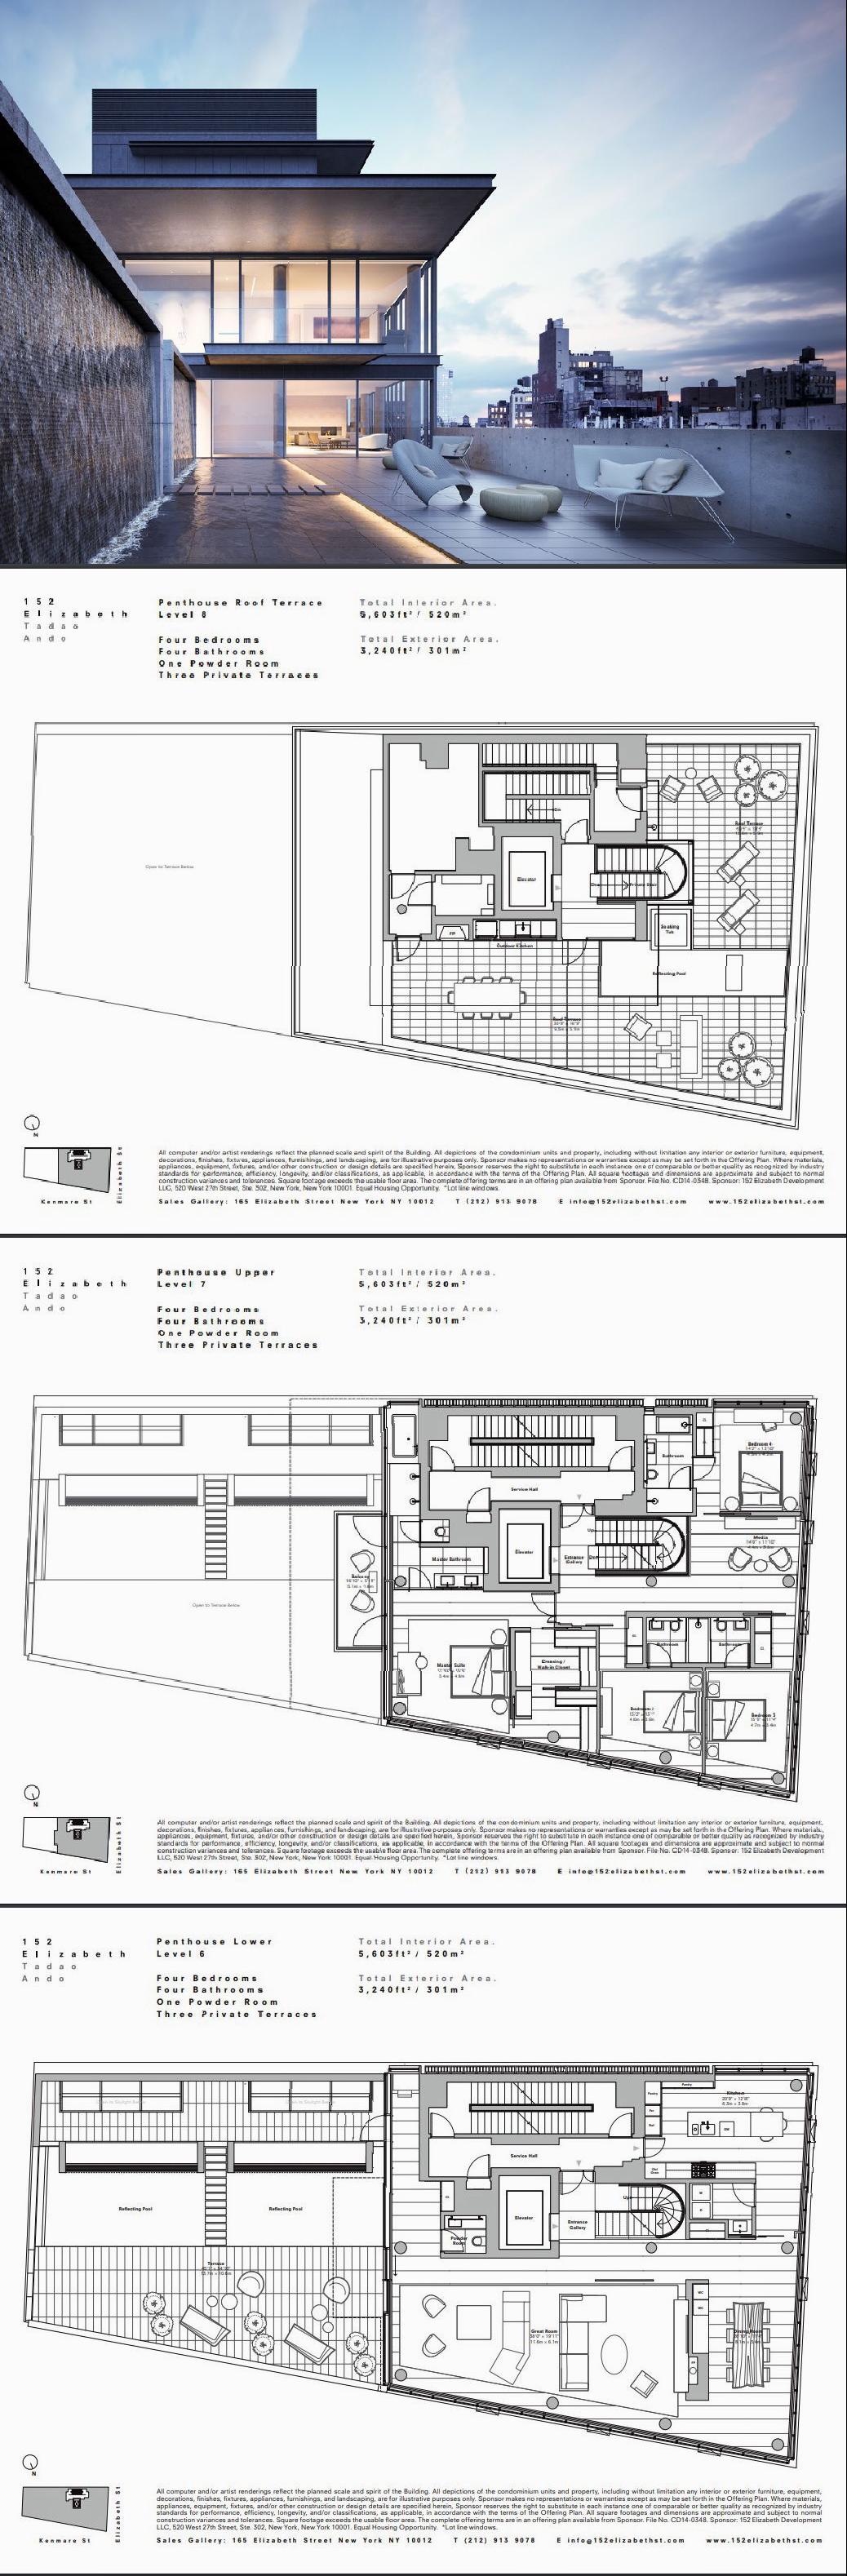 152 Elizabeth St Ph In Manhattan Manhattan Streeteasy Floor Plans Pent House Theatrical Scenery